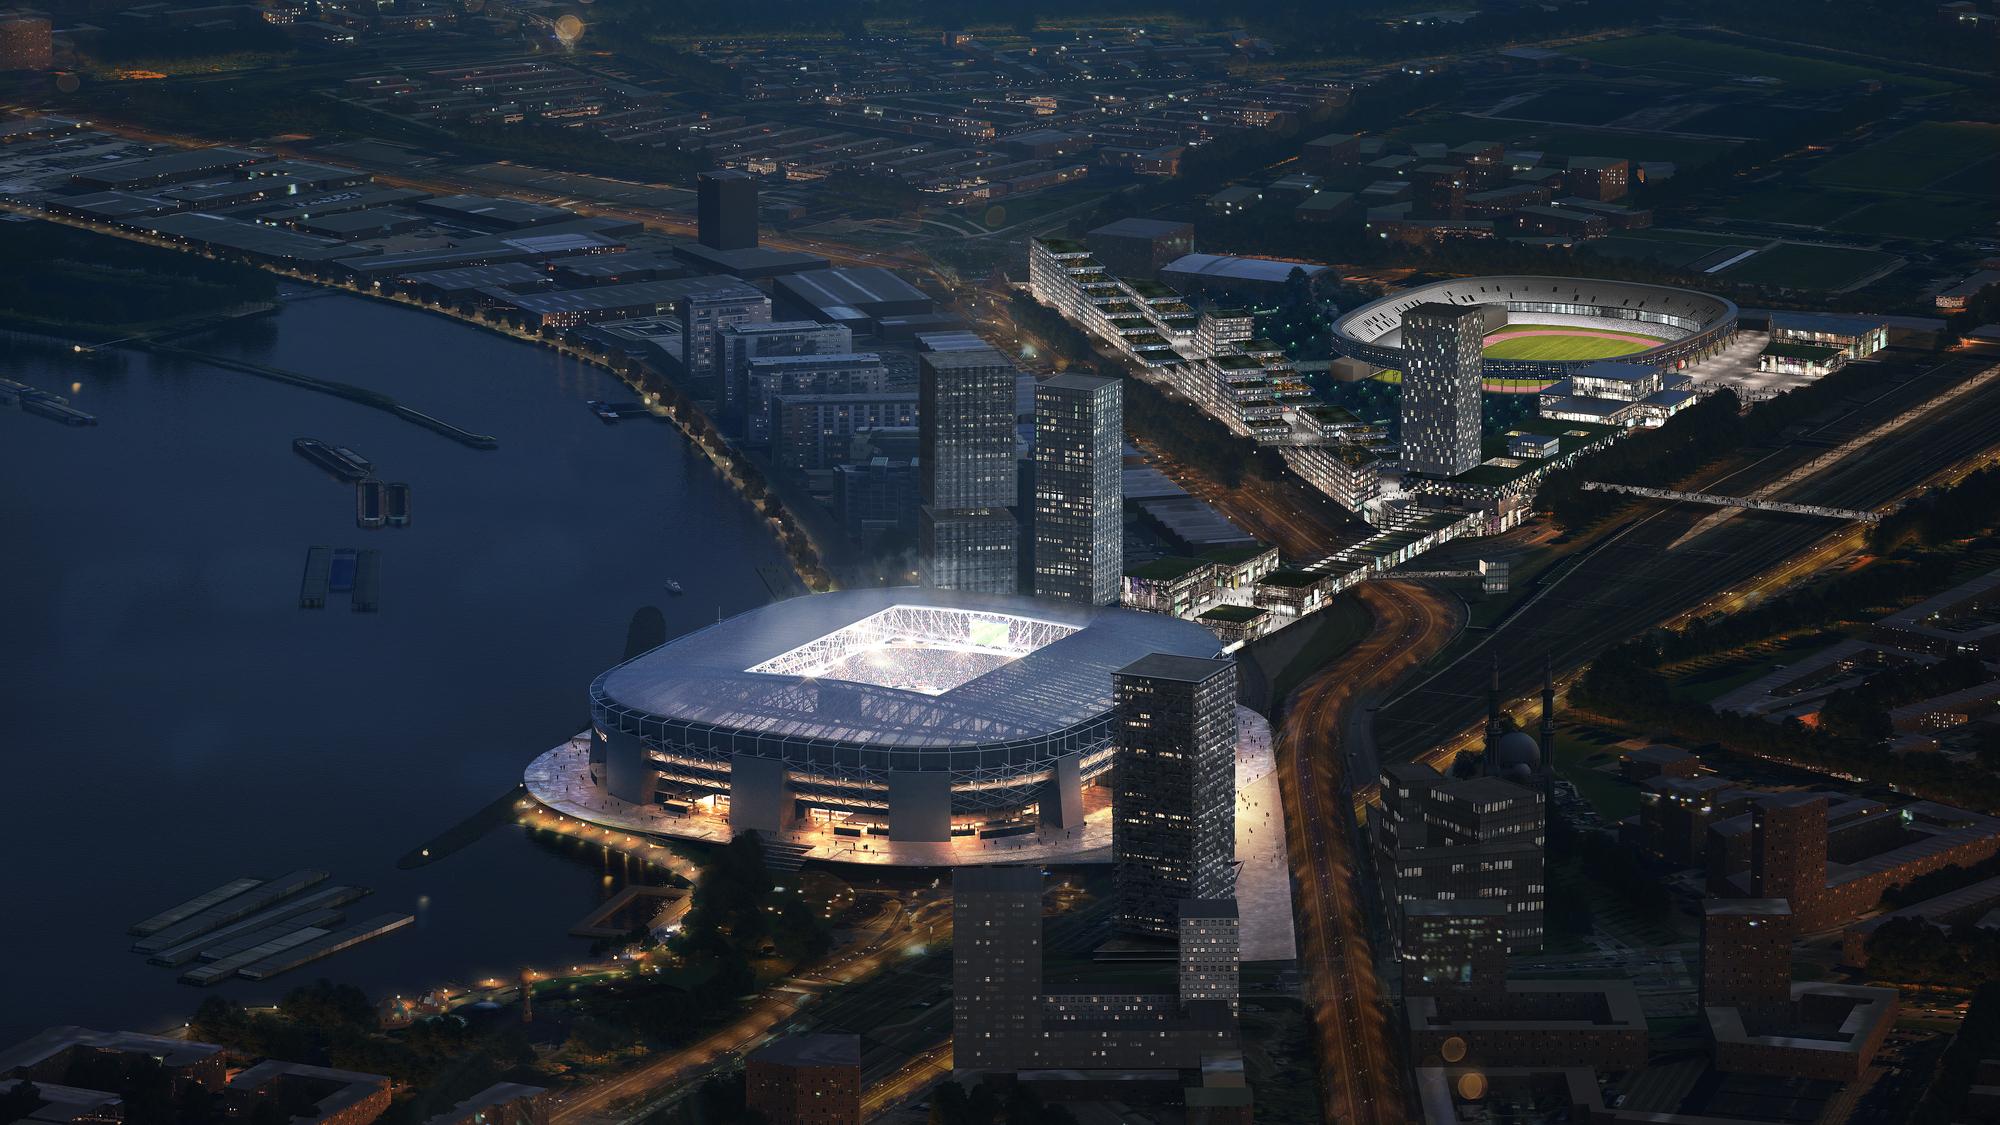 OMA Reveals New Feyenoord Stadium Design in Rotterdam | ArchDaily